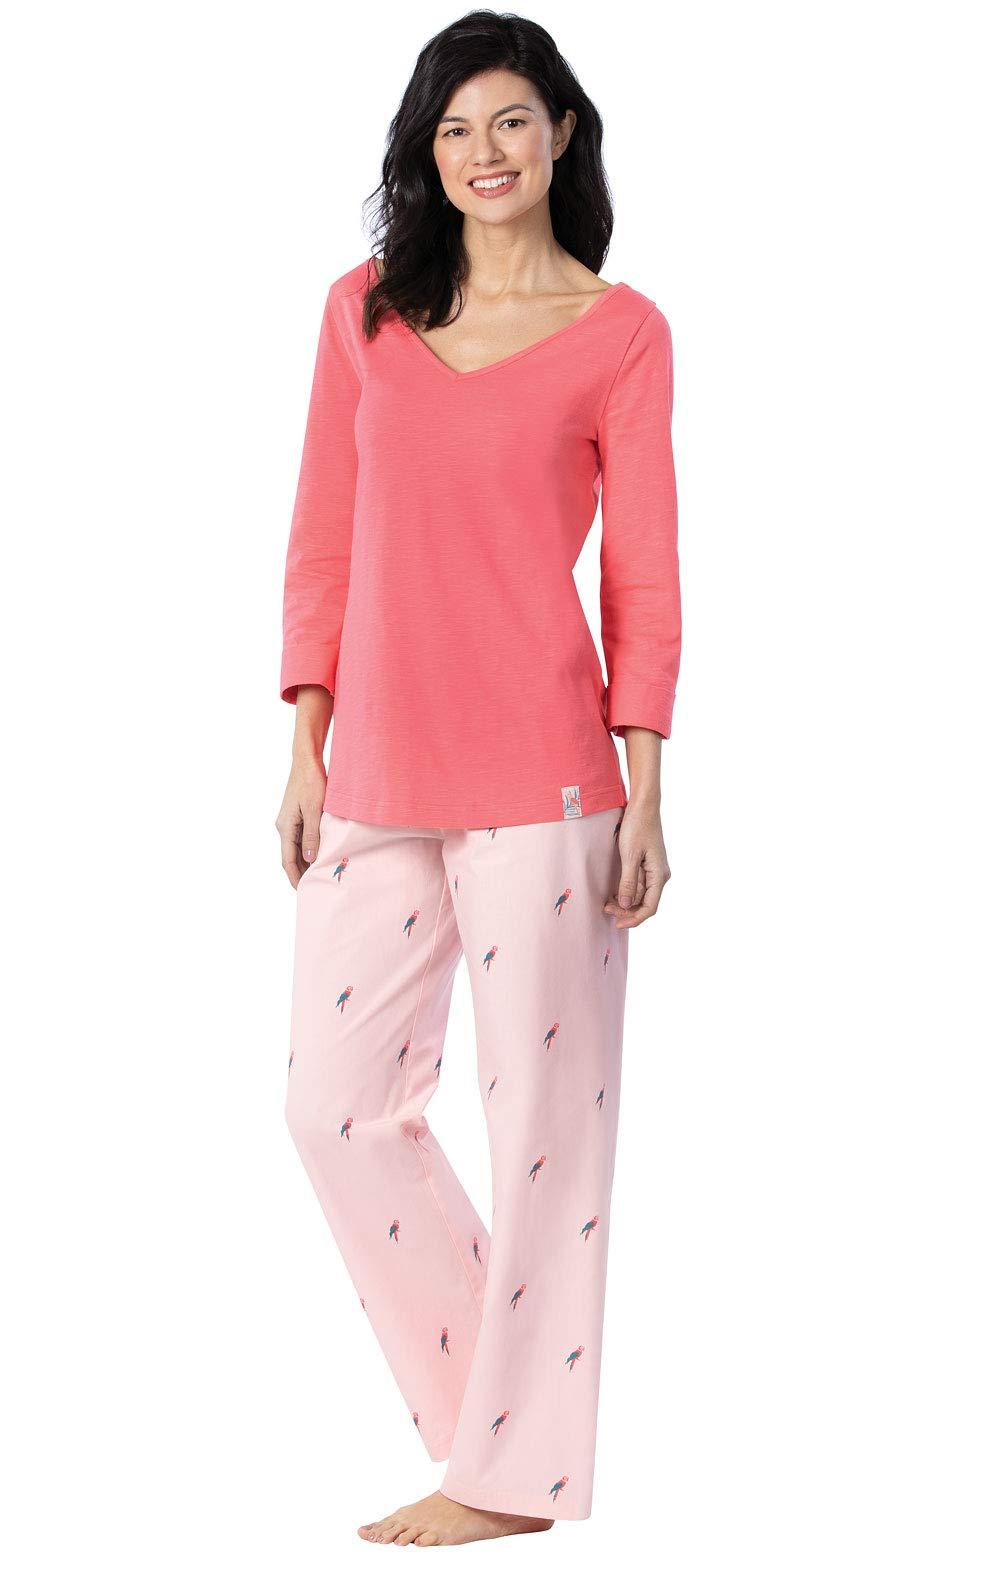 Margaritaville Women's Pajamas by PajamaGram - Tie Back, Coral, Medium, 8-10 by PajamaGram